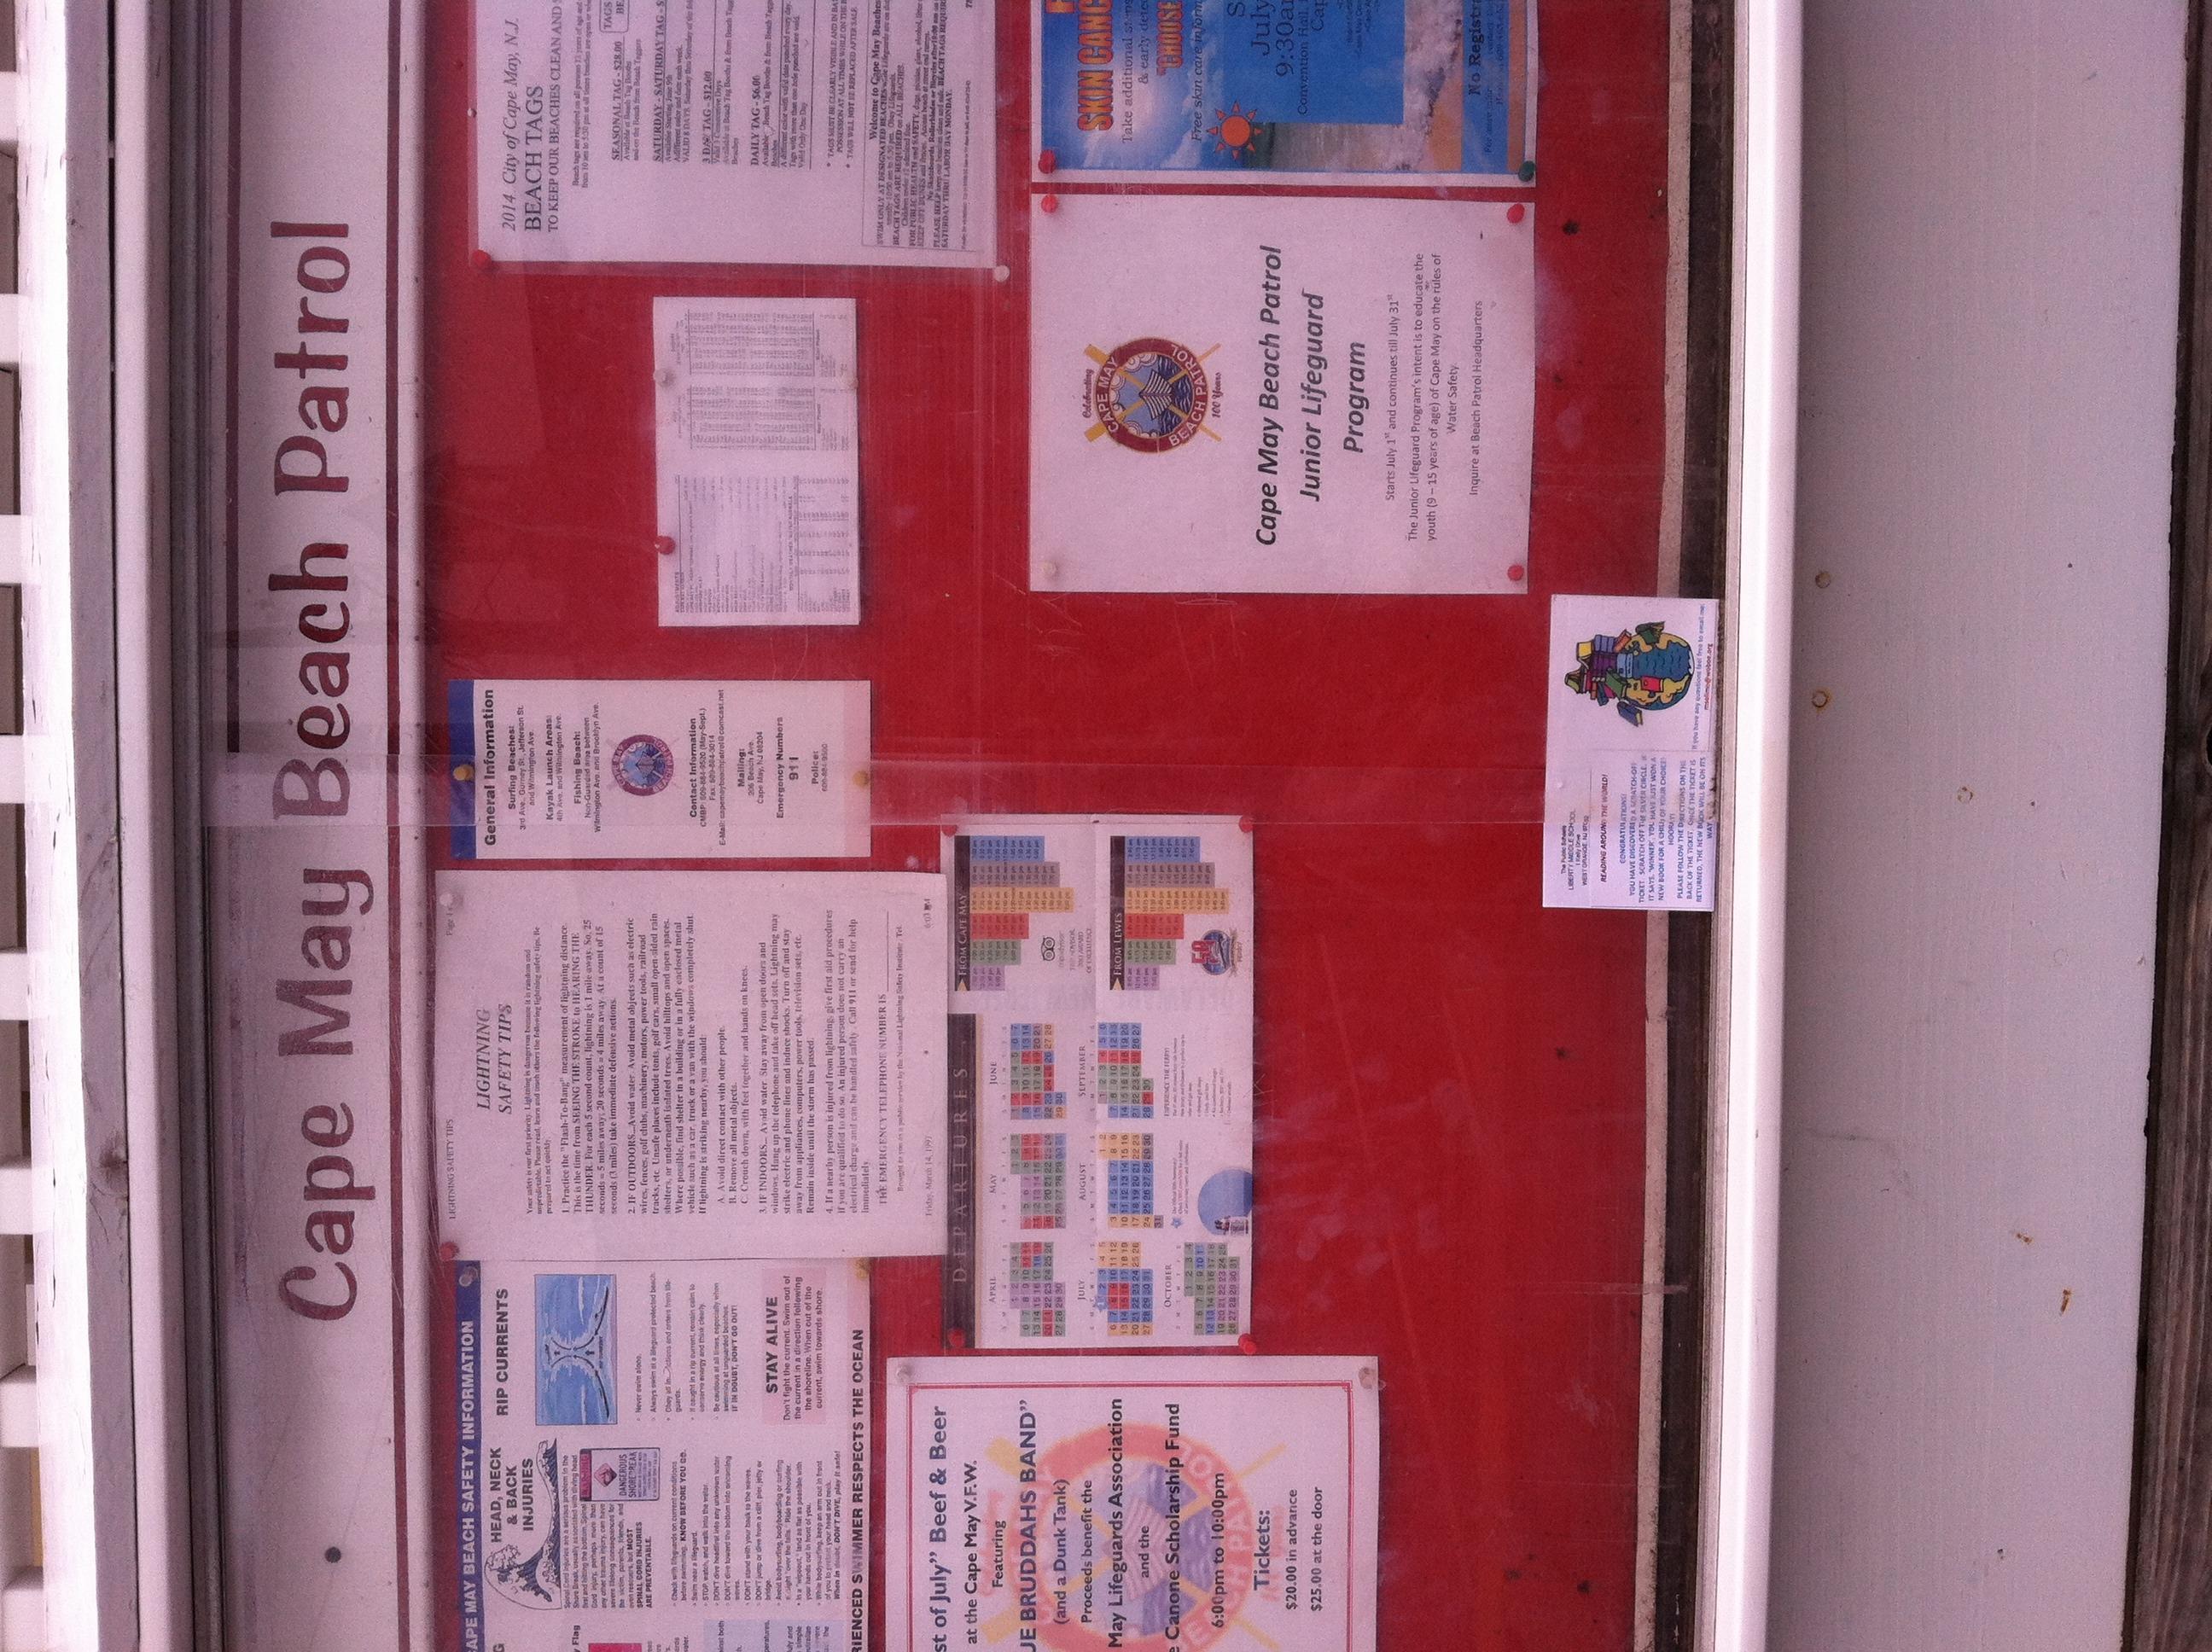 a785cf2f7dc29c66df32_cape_may_beach_patrol_headquarters.JPG